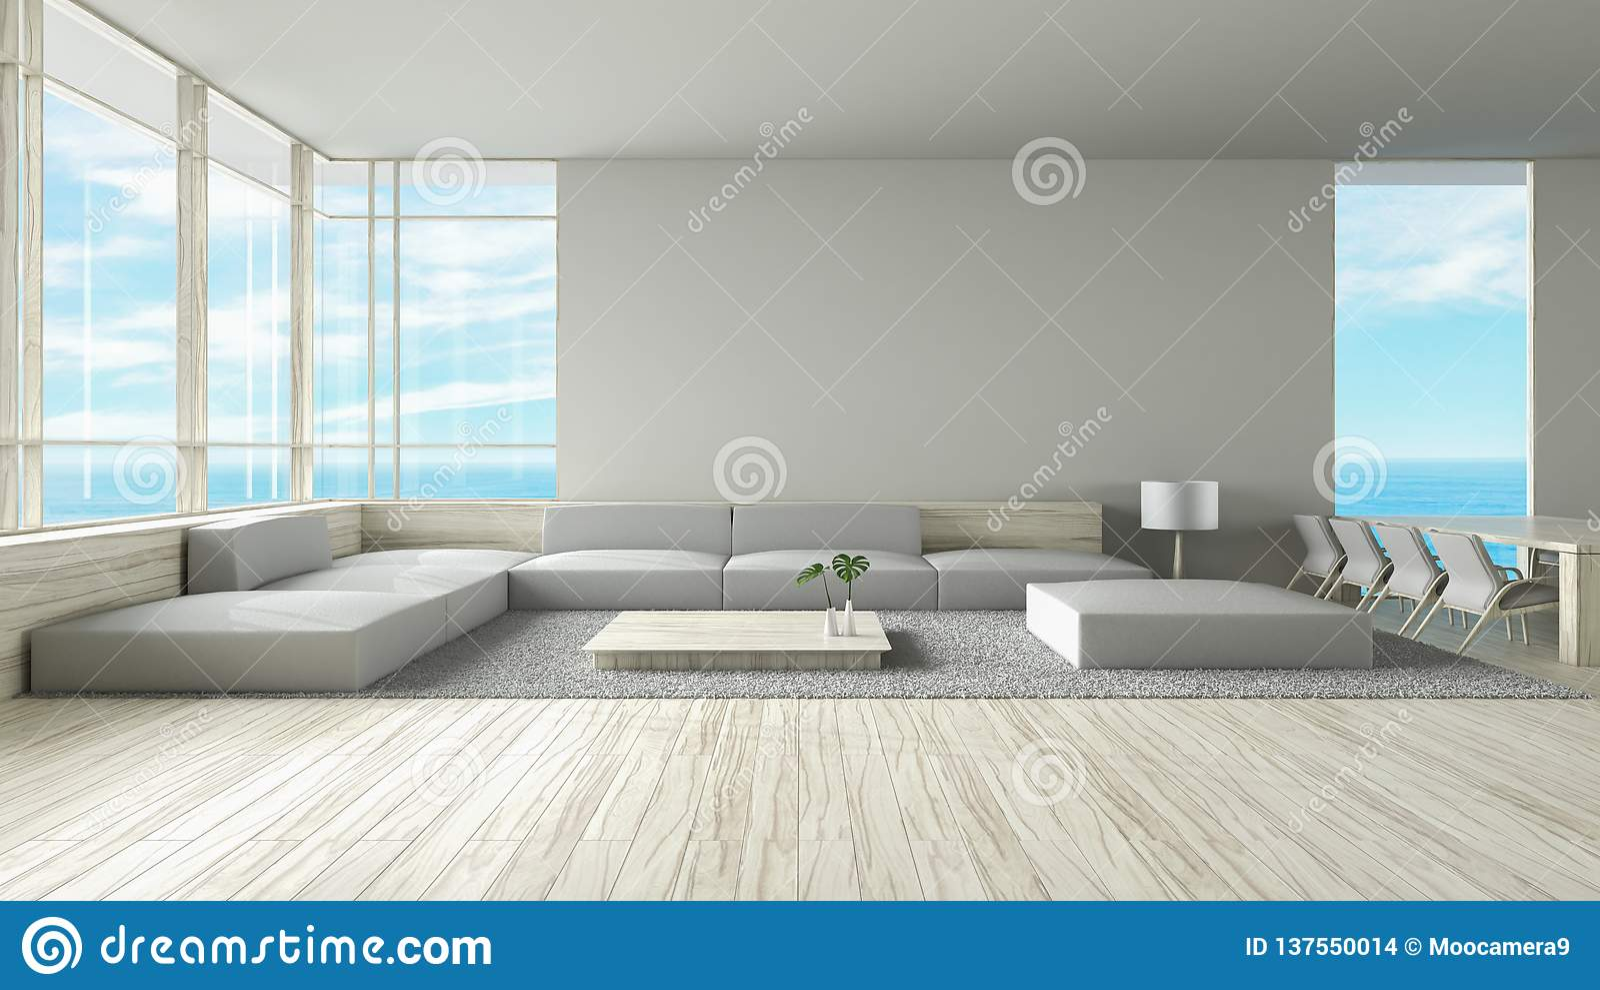 modern interior living room wood floor sofa set sea view summer d rendering modern interior living room wood floor sofa set sea